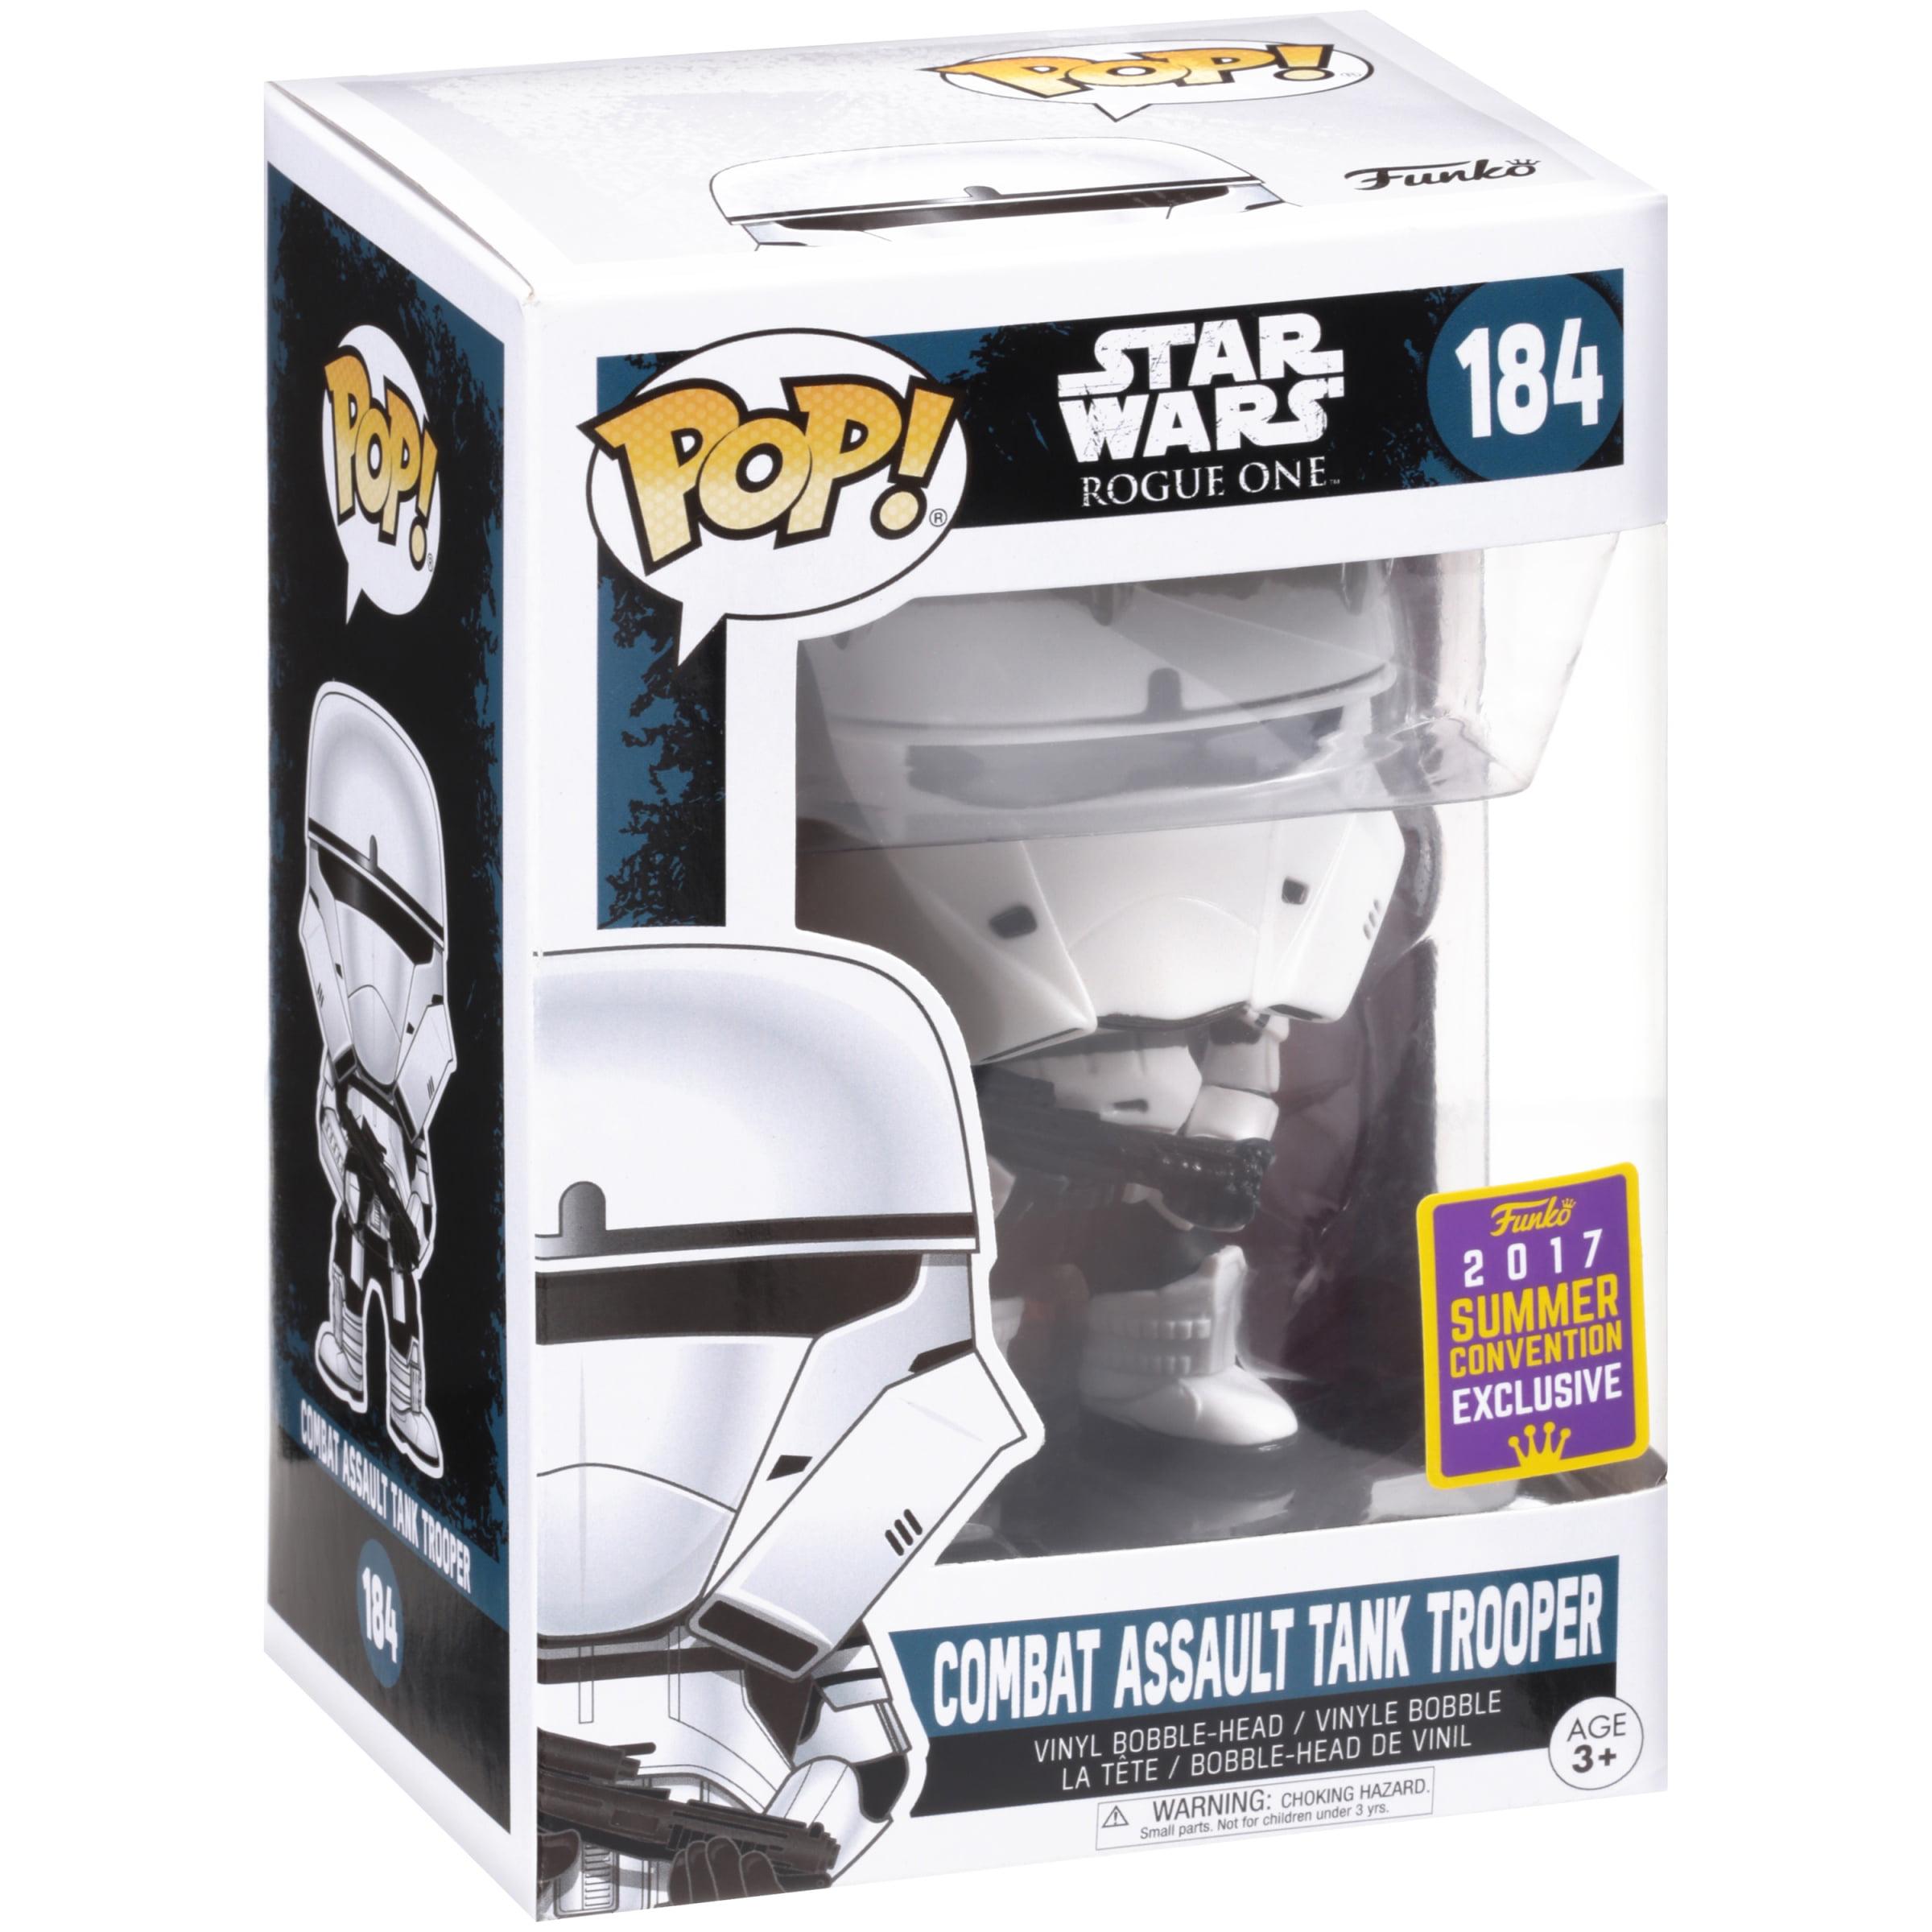 4706b034073564 POP Star Wars  Rogue One - Combat Assault Tank Trooper Summer Convention  Exclusive - Walmart.com